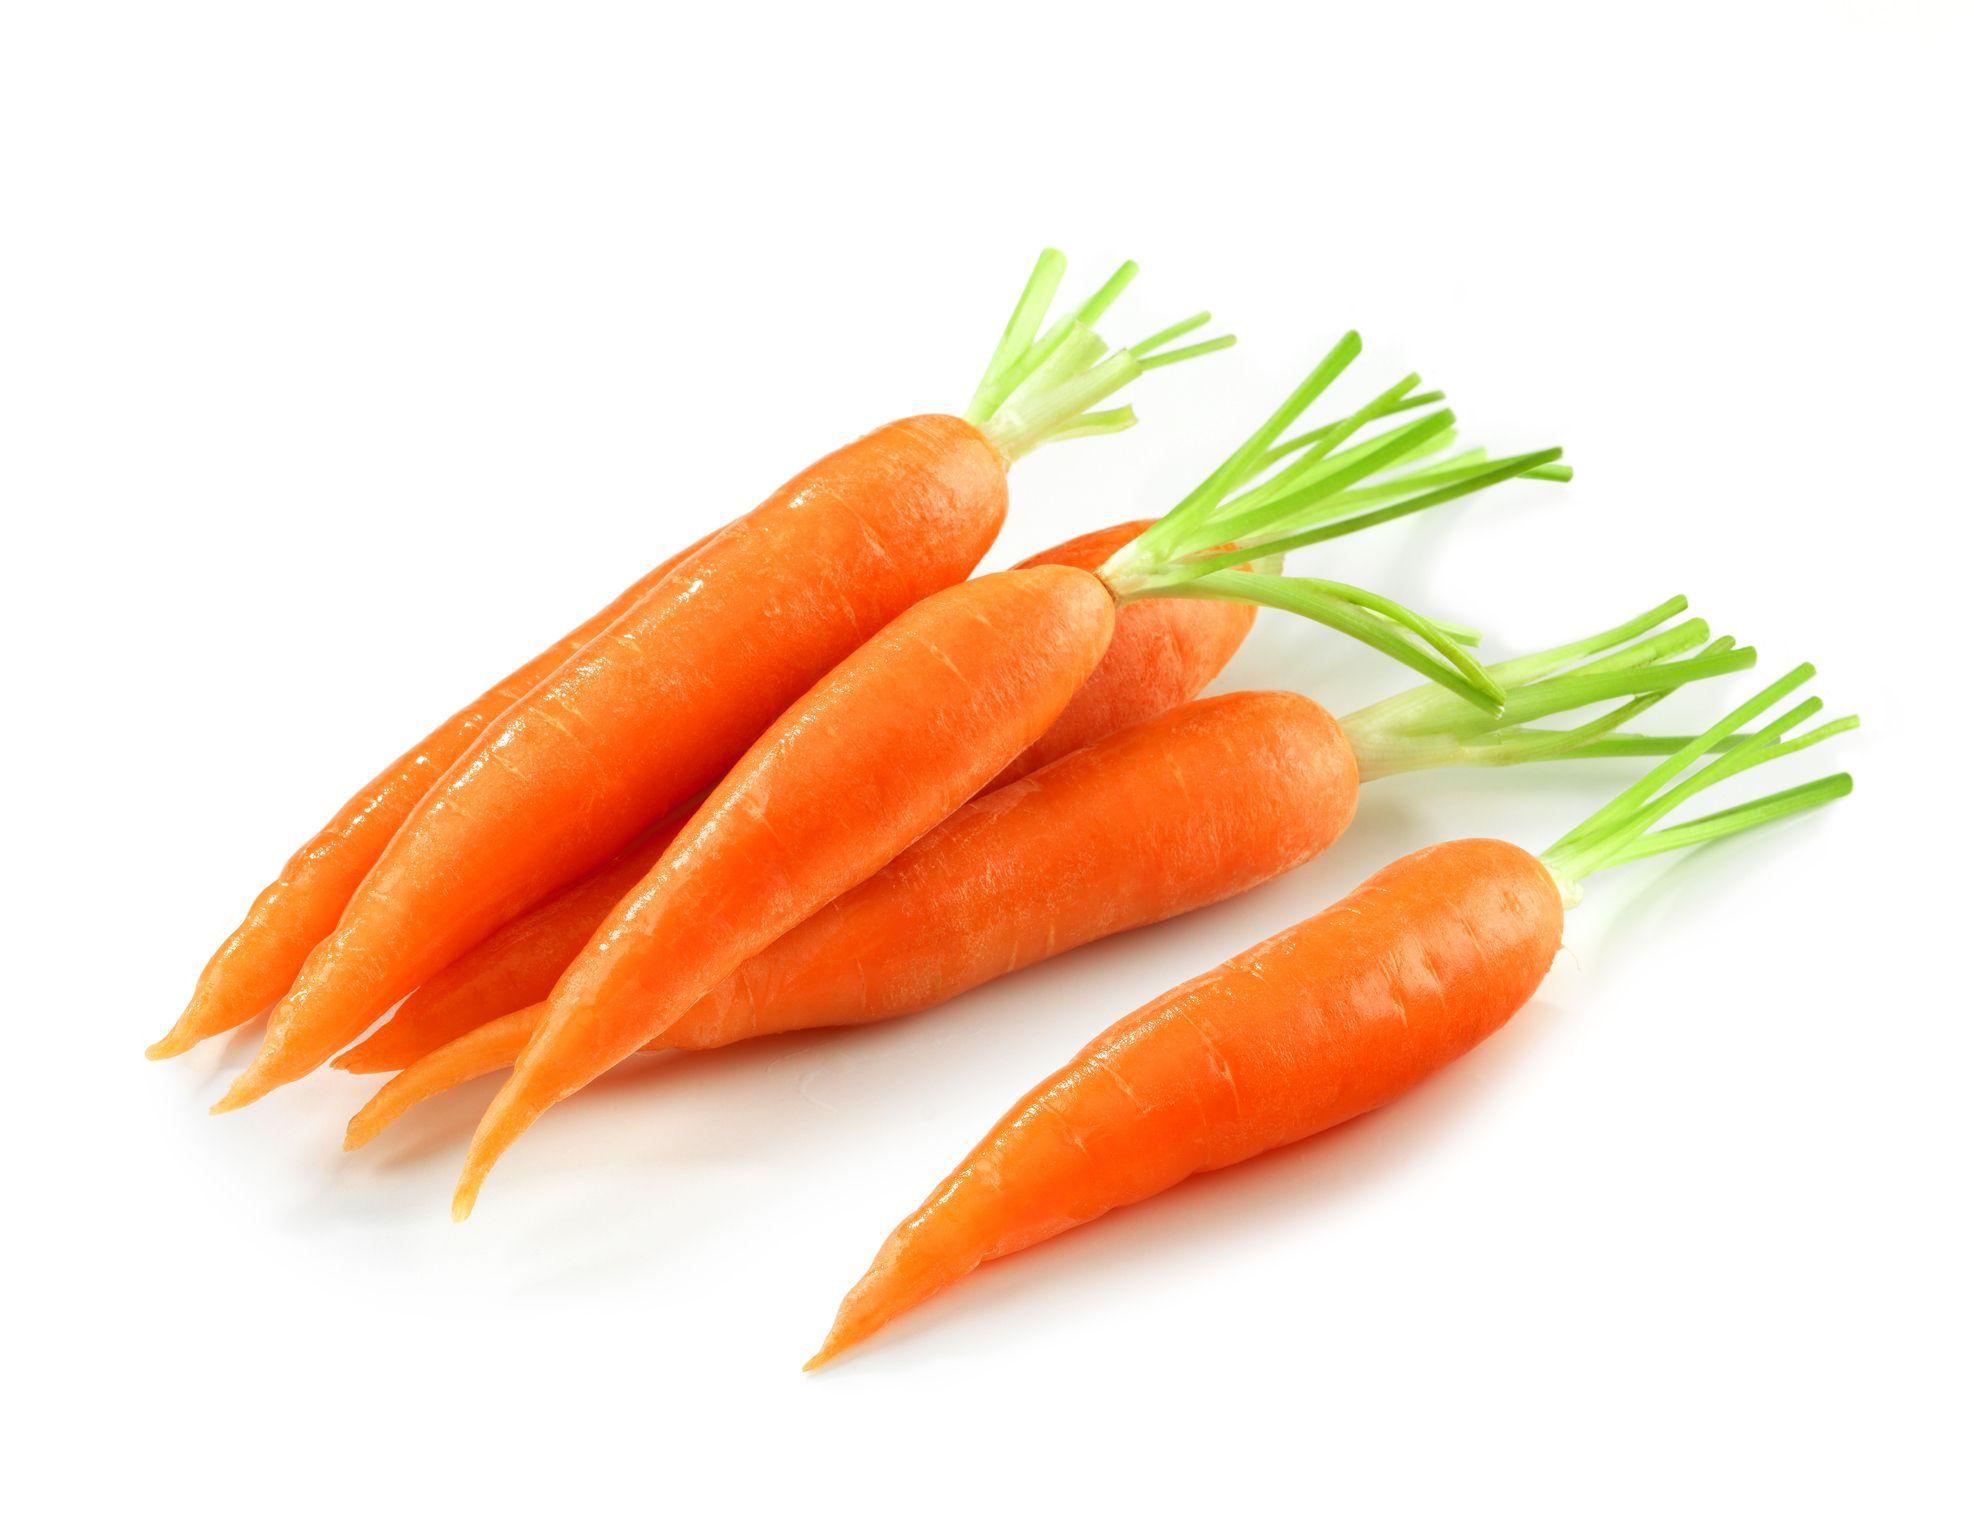 14 Best Foods for Skin - Foods Good For Skin Health